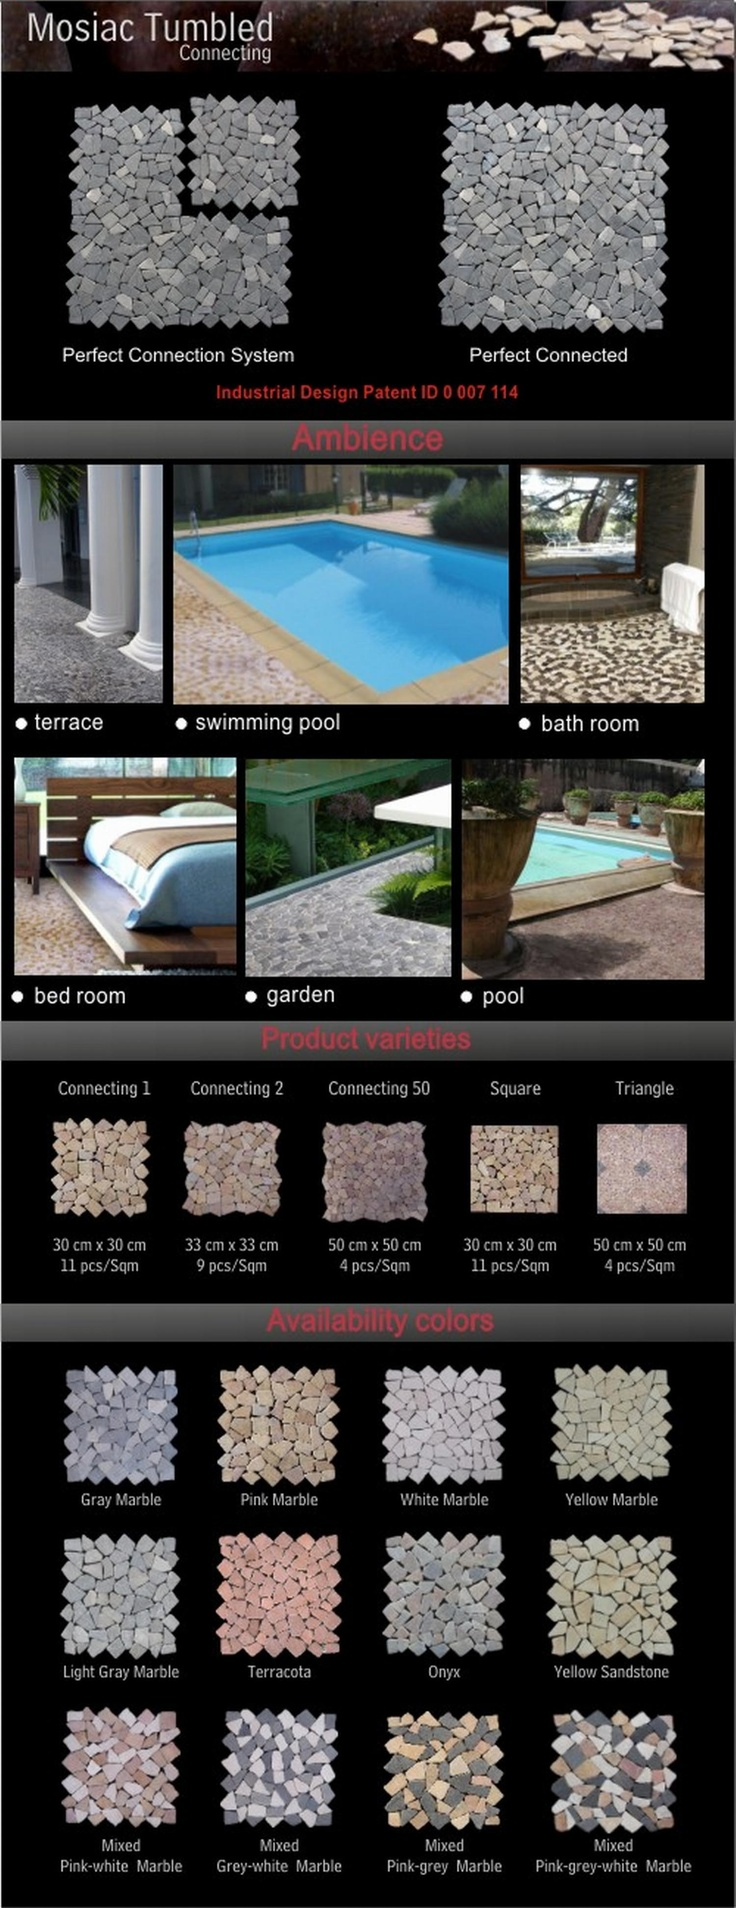 de_atmo@yahoo.com Stone Tumbled Mozaic